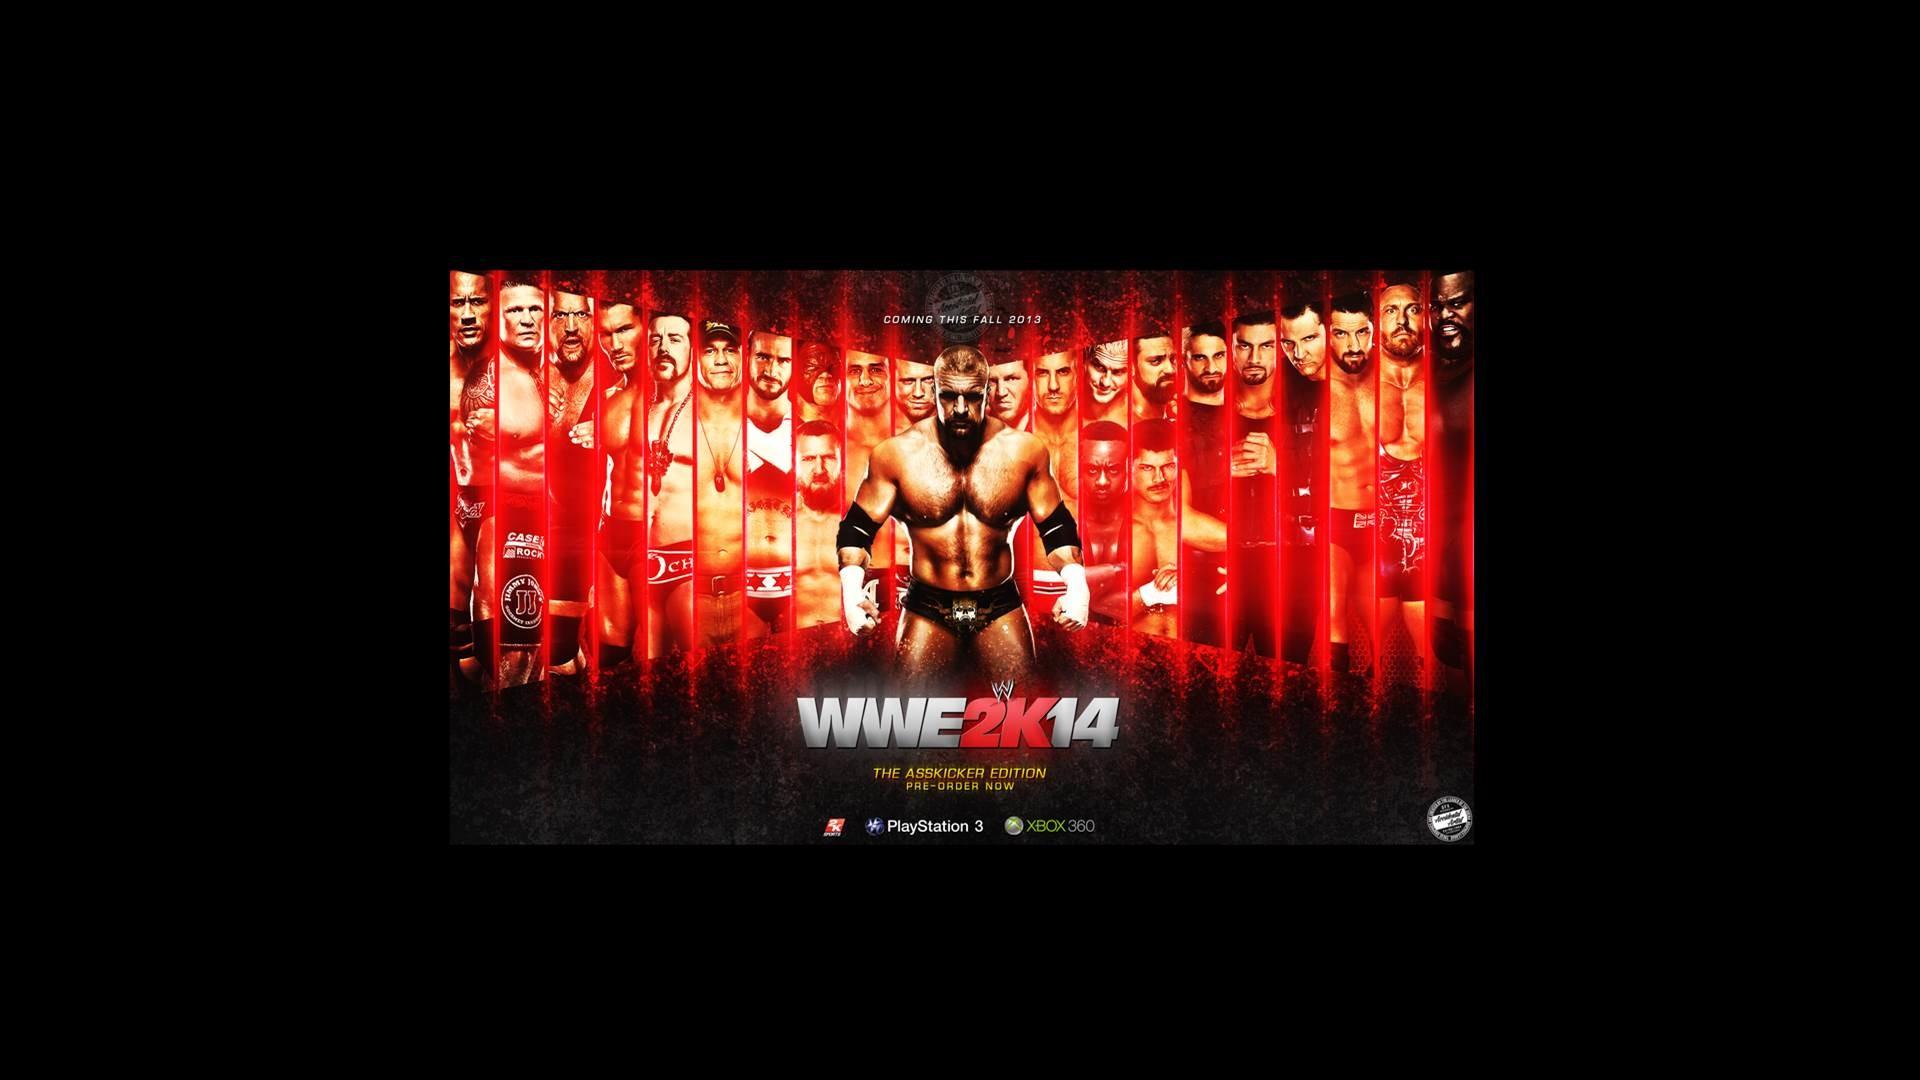 1920x1080 Finn Balor Wallpapers 2017 Whb 2 FinnBalorWallpapers2017 FinnBalor WWEFinnBalor Wwe Wrestling Hdwallpapers